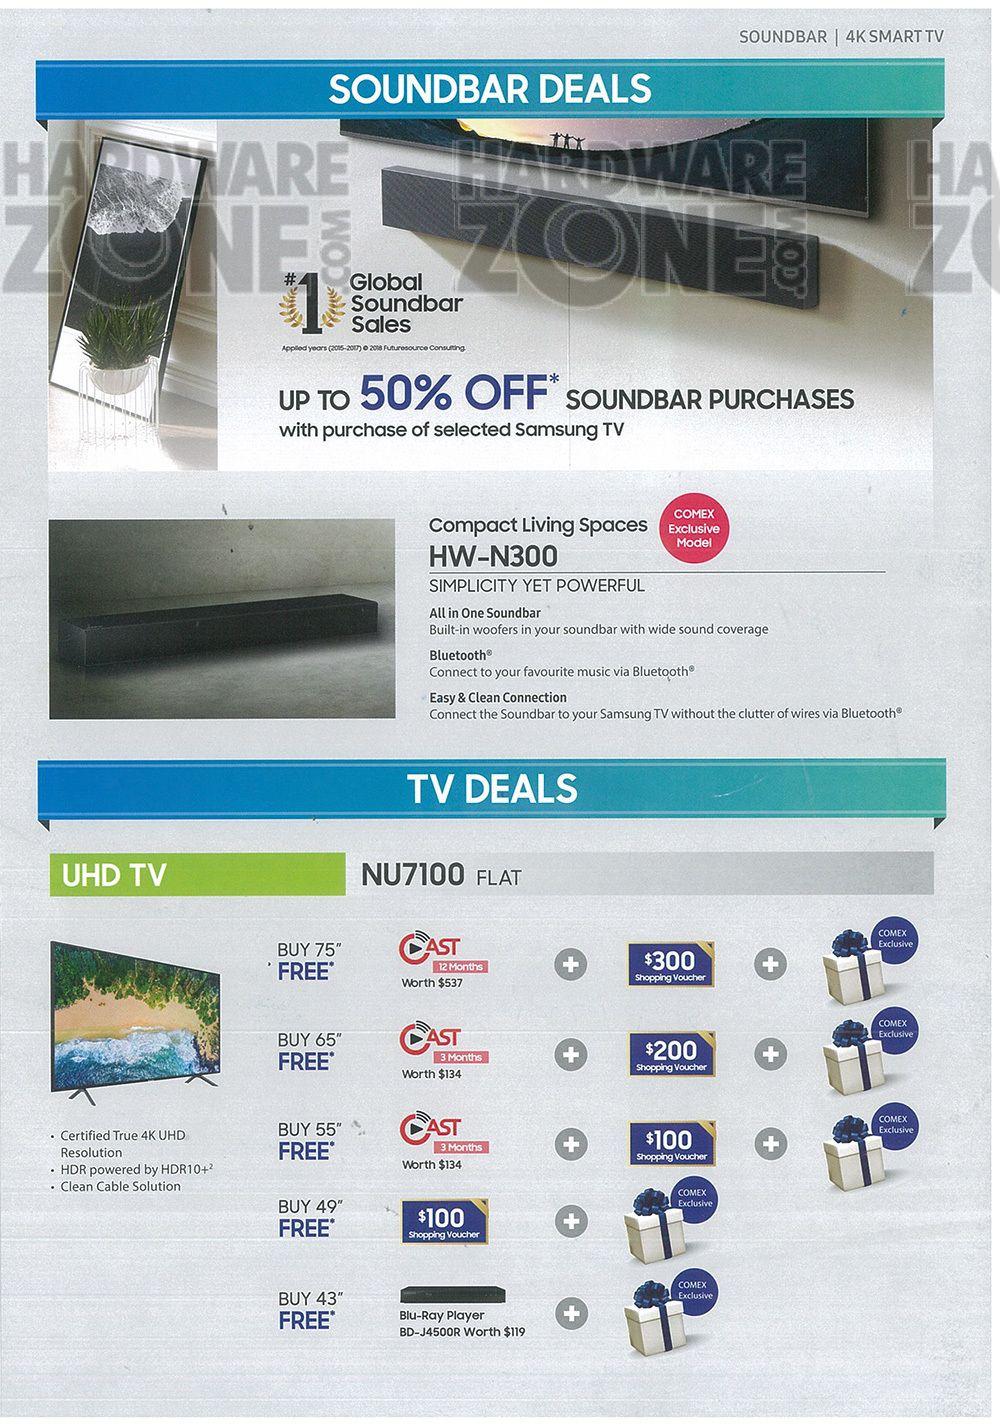 Samsung TVs Pg 1 Samsung tvs, Samsung televisions, Samsung